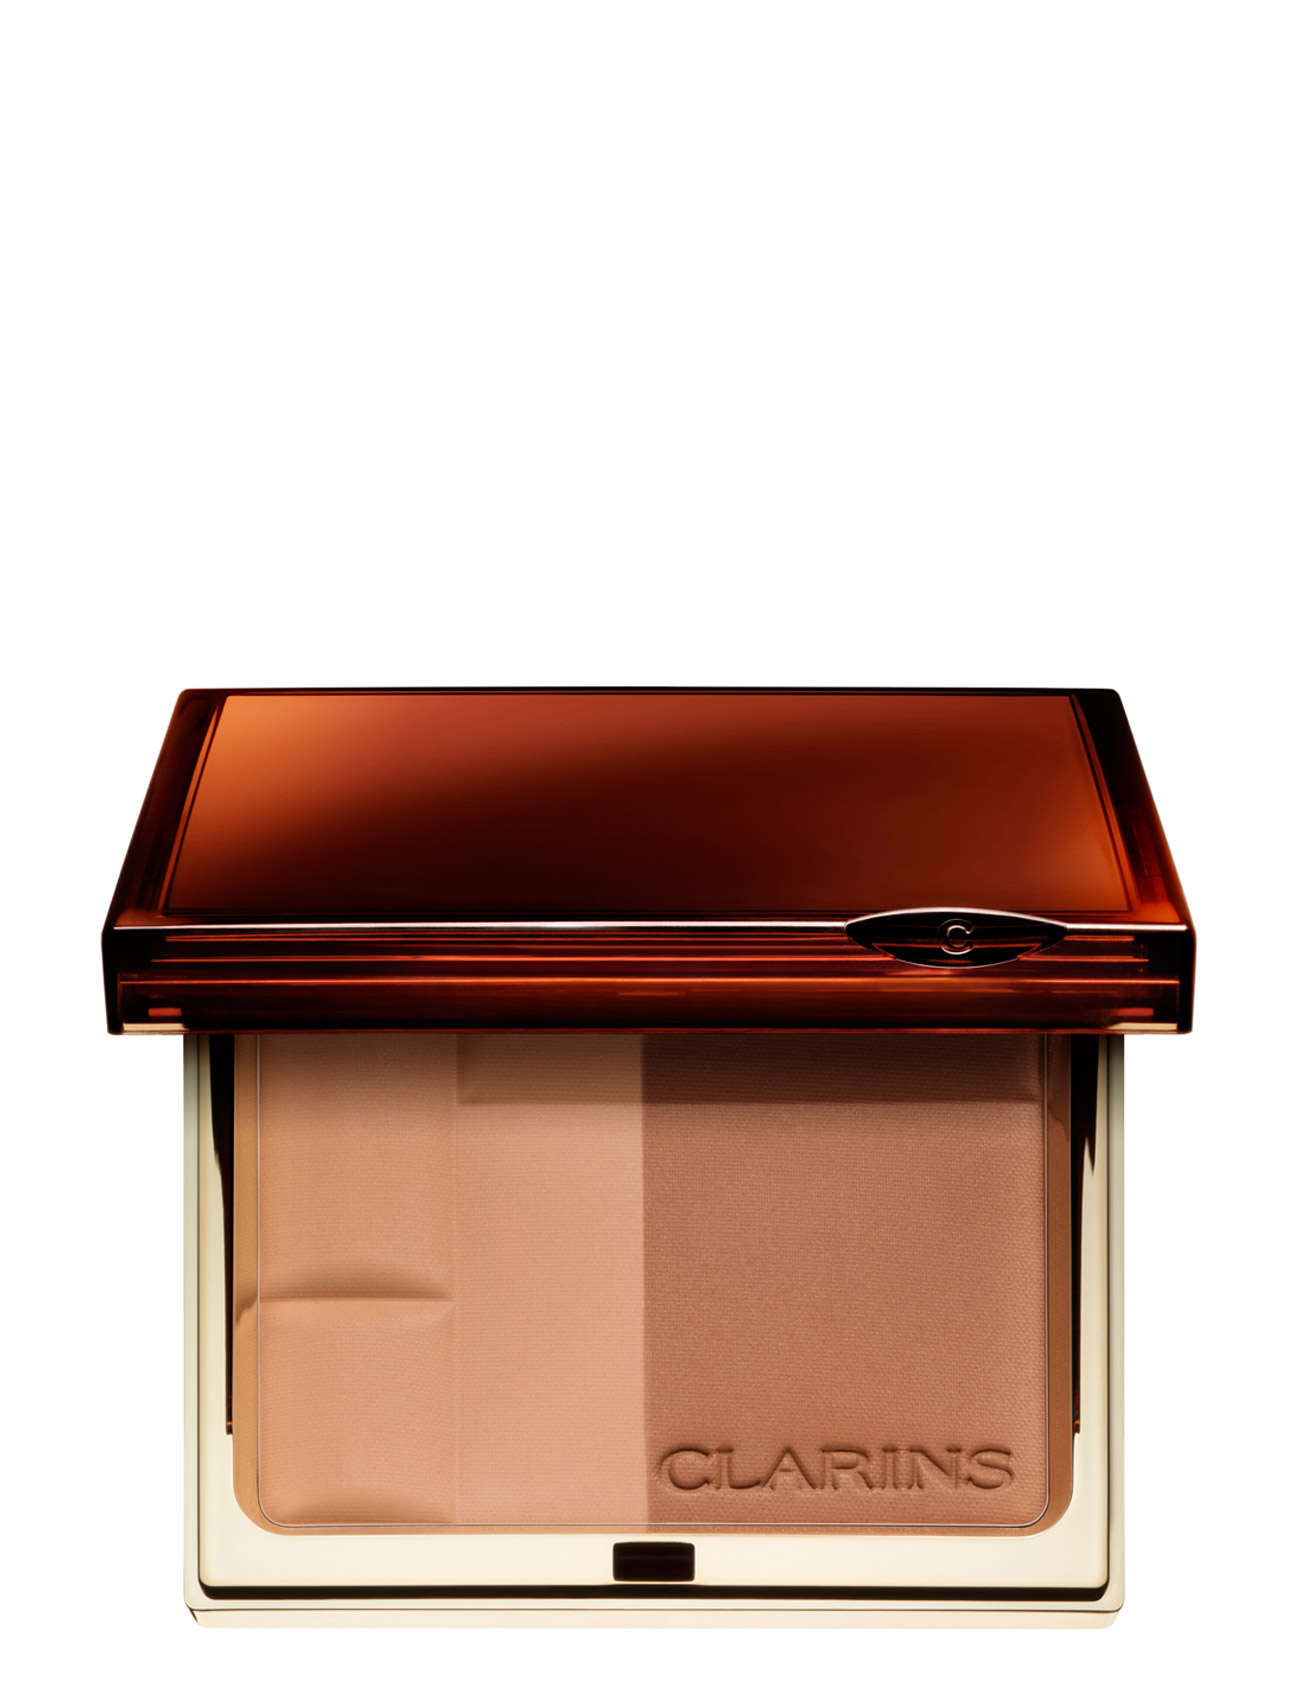 clarins Clarins bronzing duo spf15 powder c på boozt.com dk